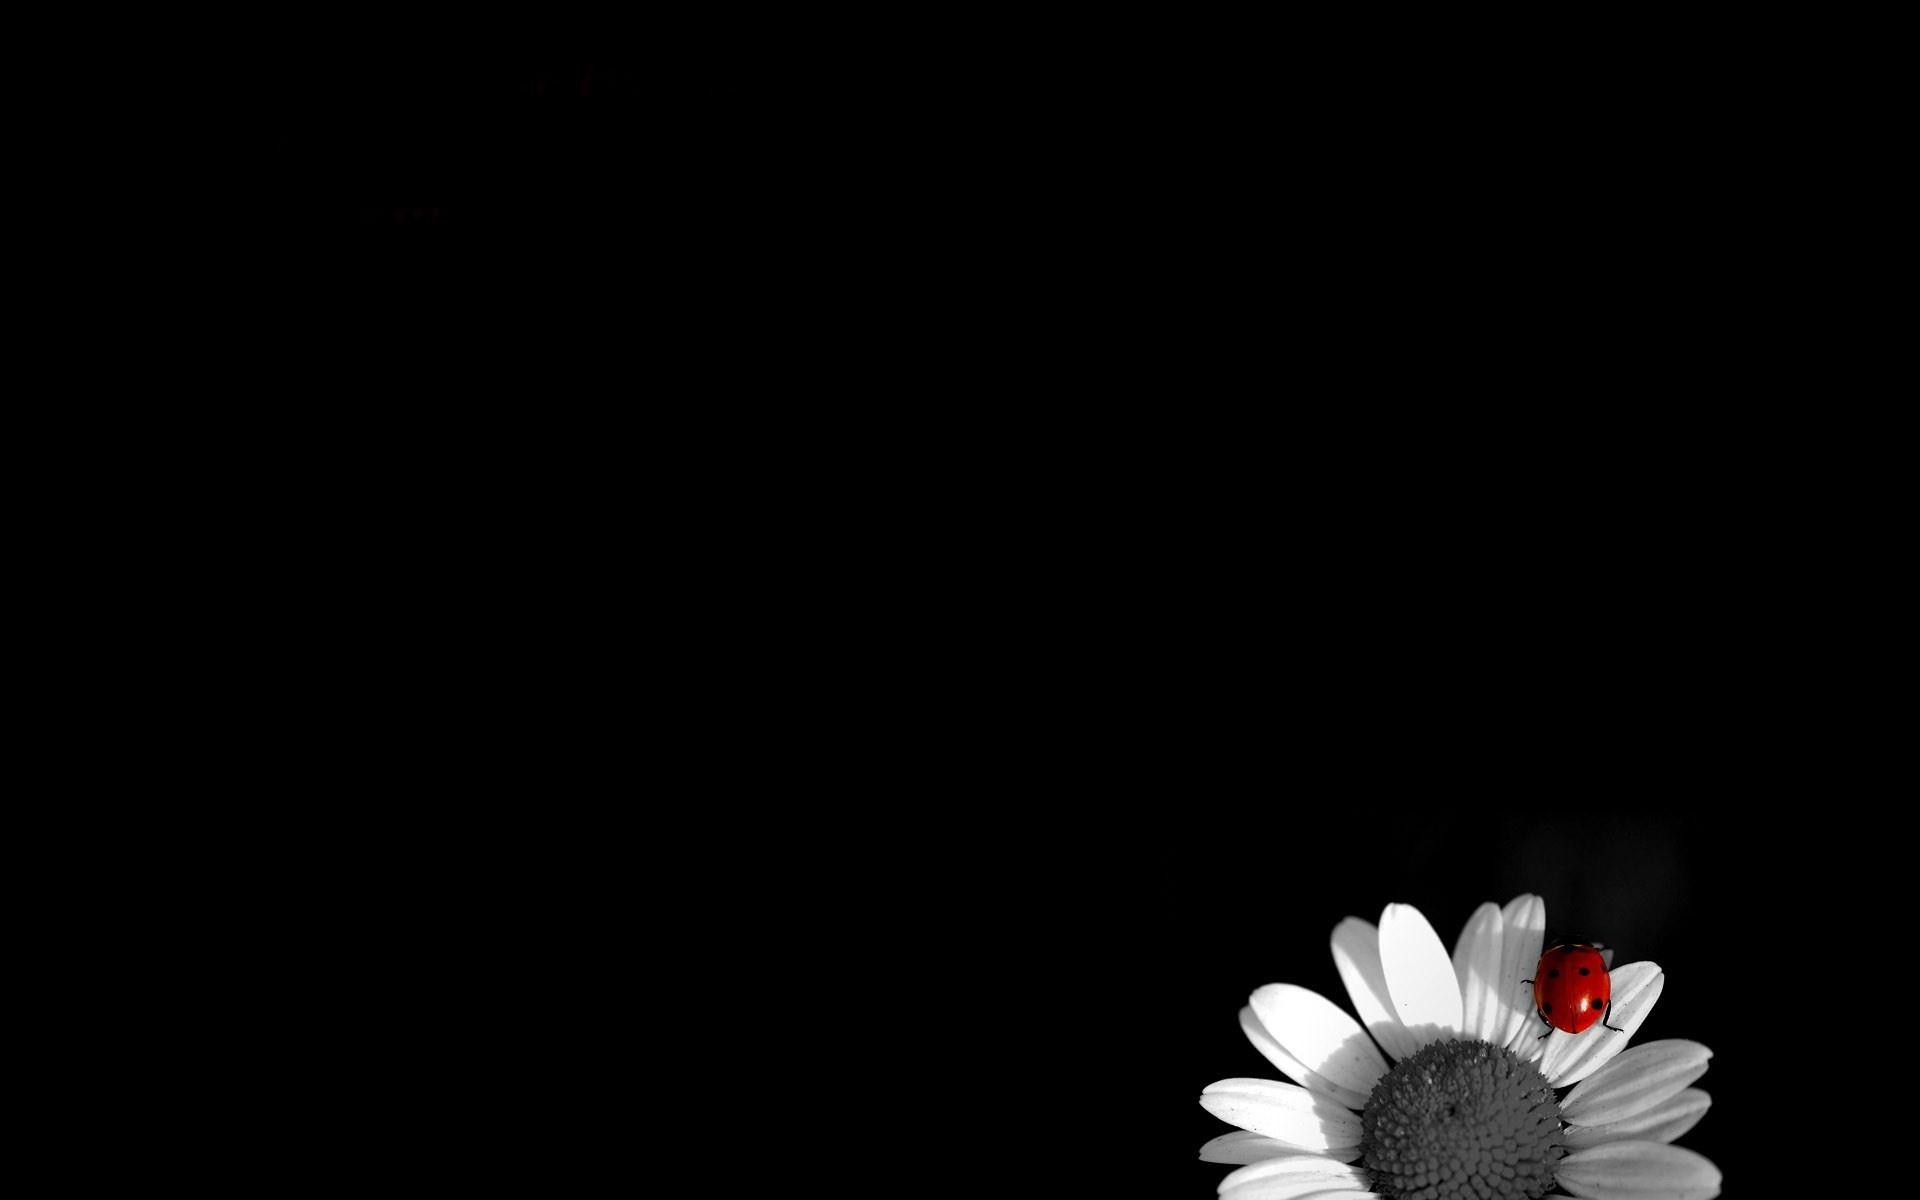 Black Wallpaper Pc Pinterest